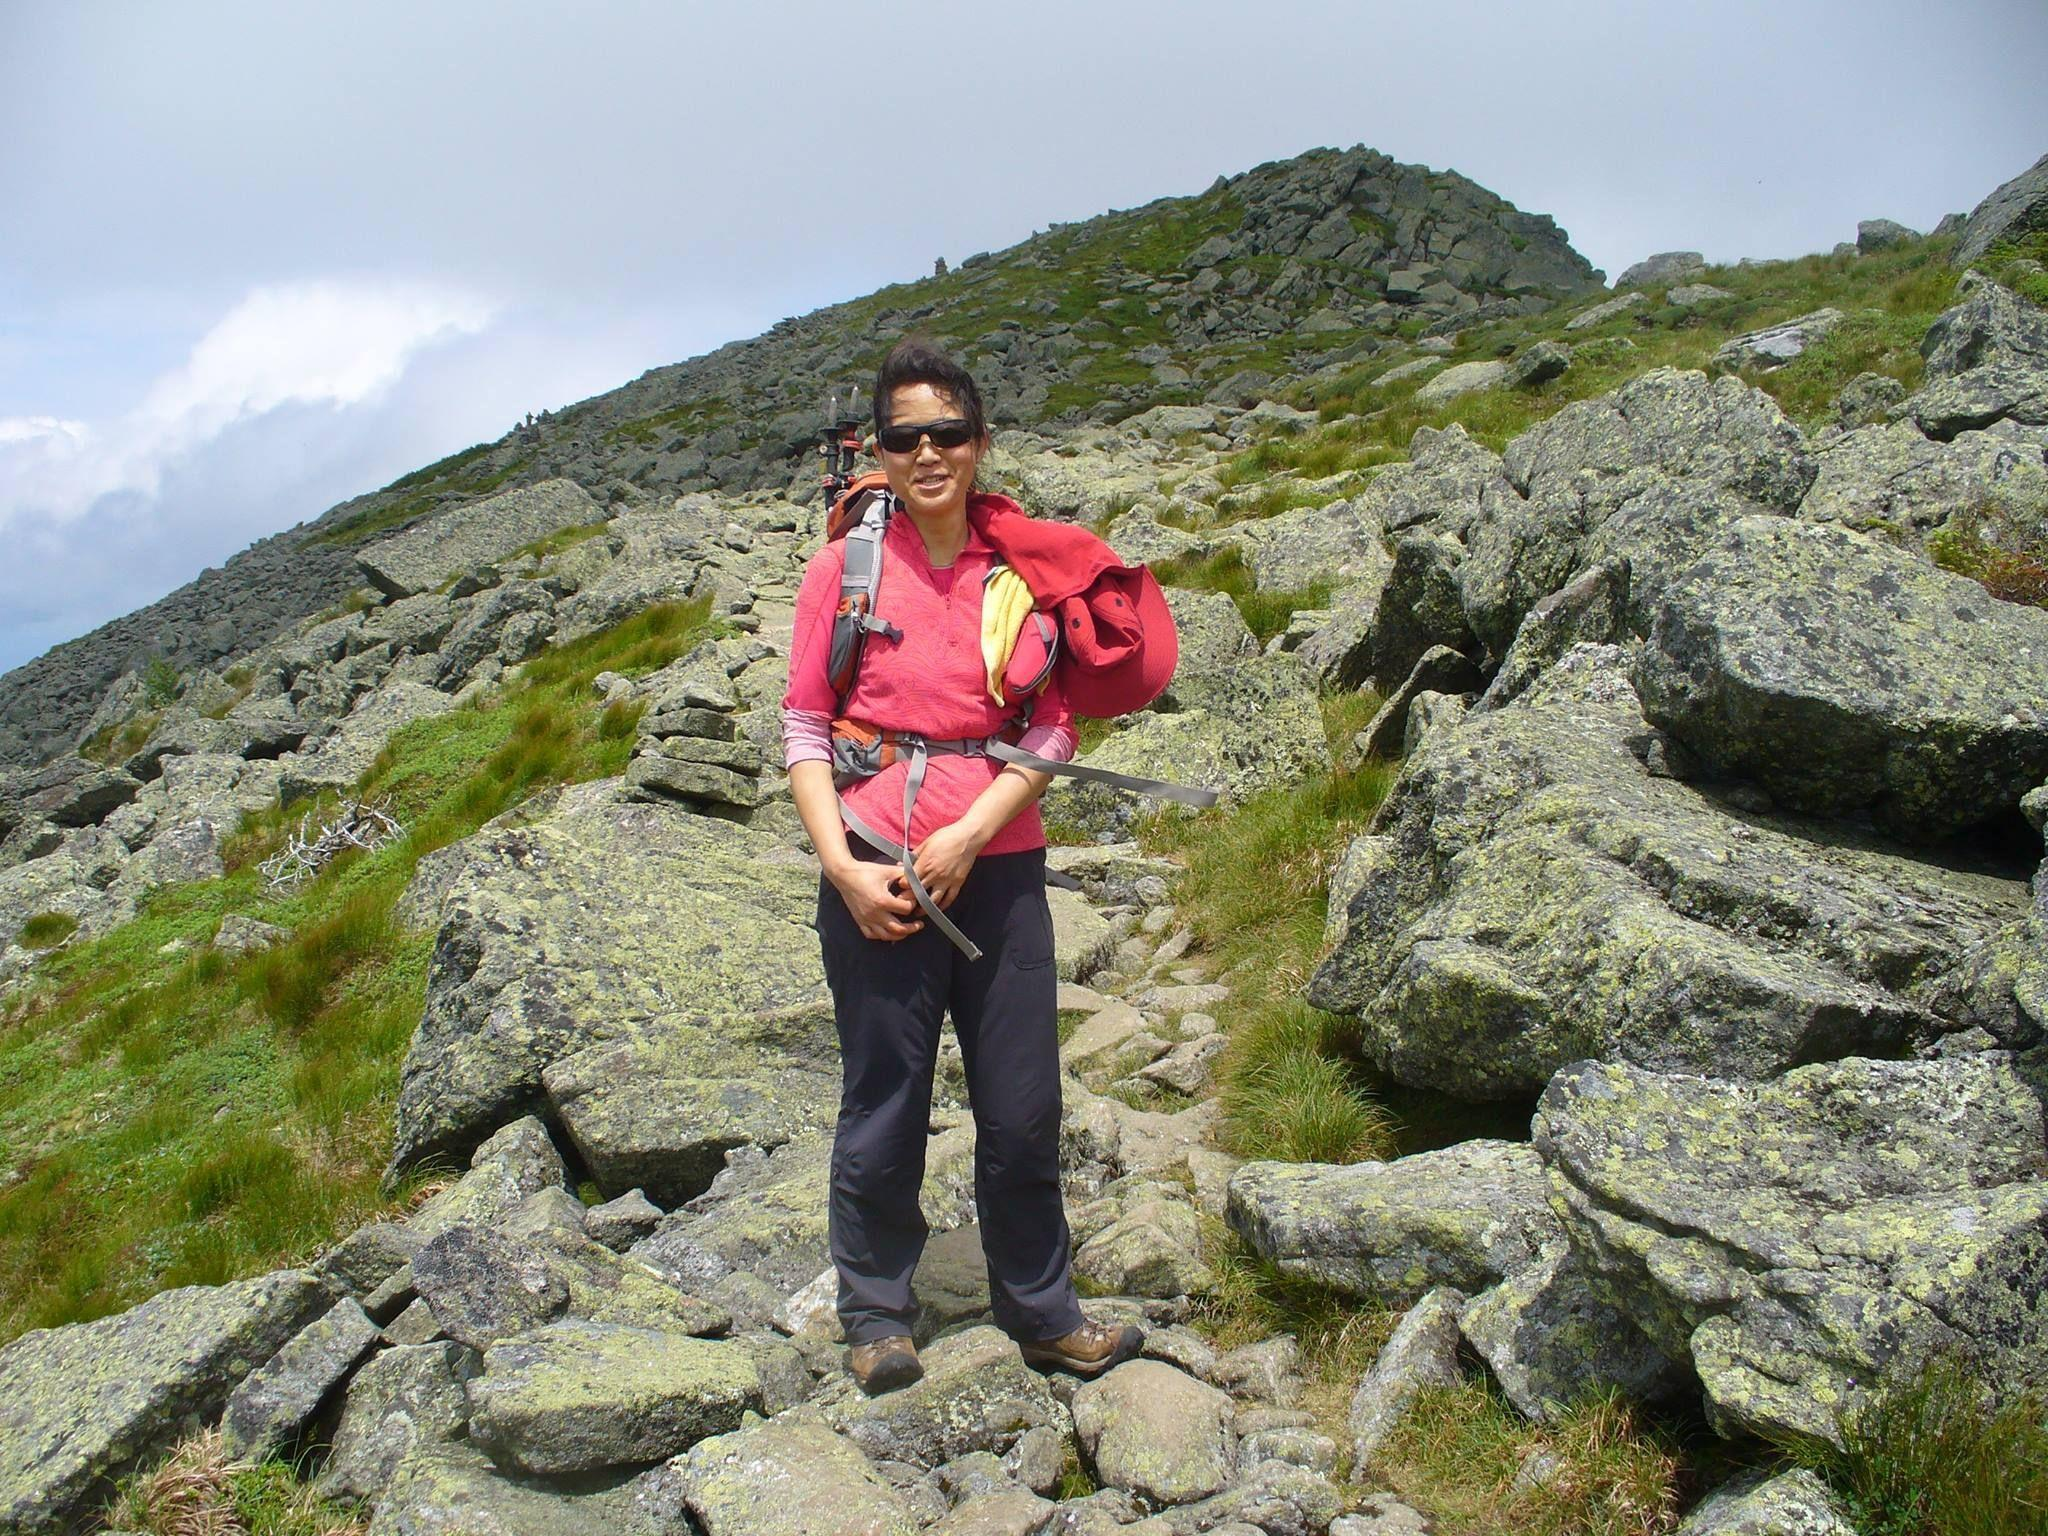 meet up hiking group